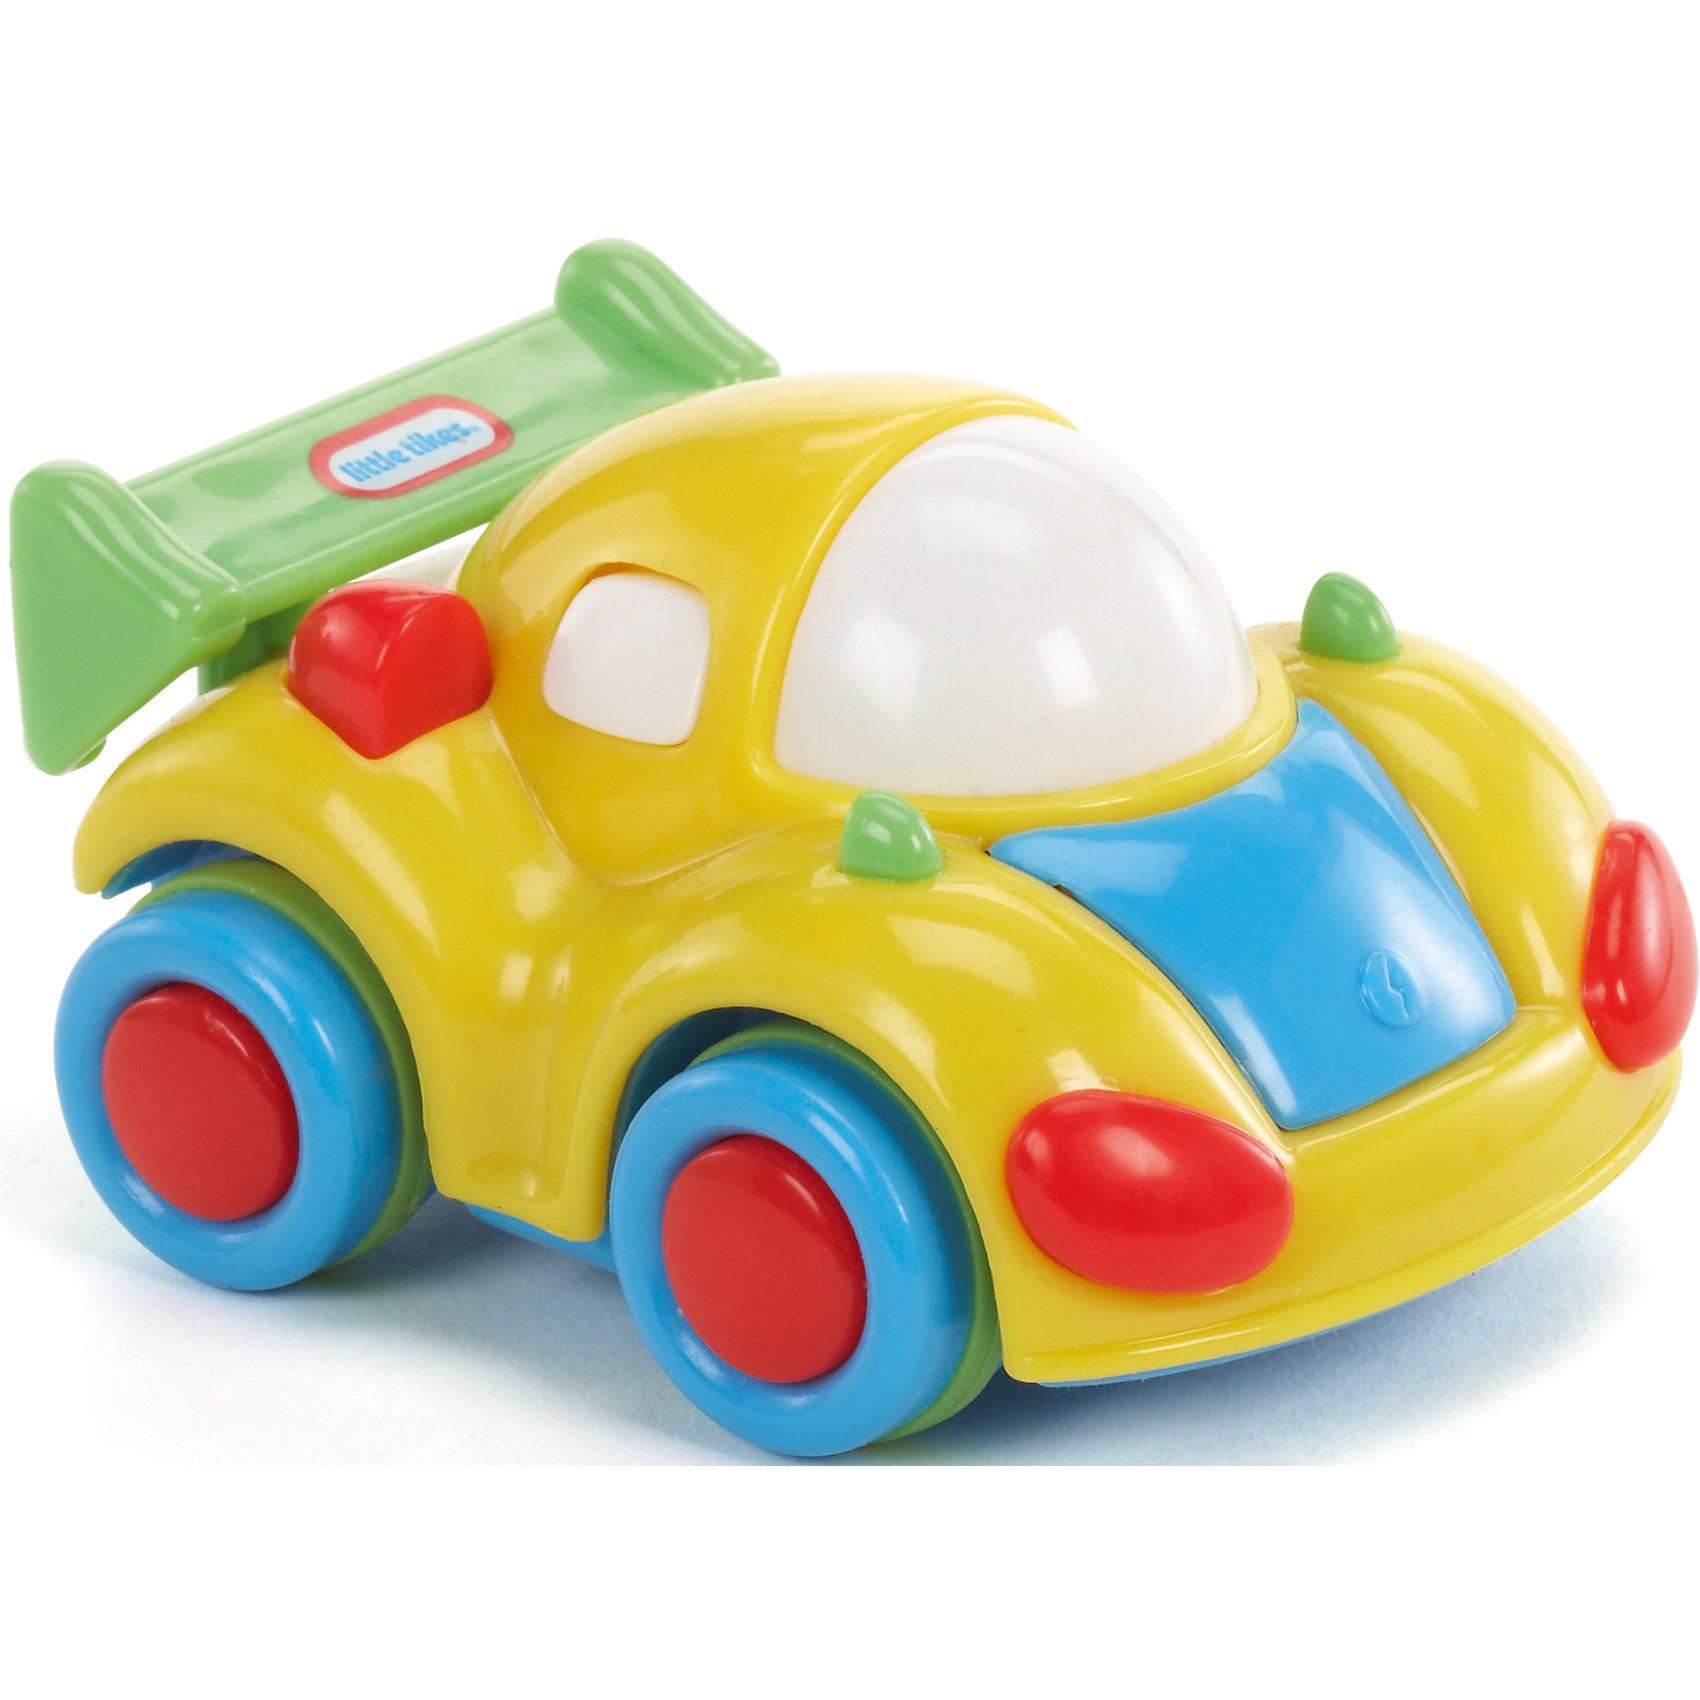 Машинка, Little TikesМашинки и транспорт для малышей<br><br><br>Ширина мм: 65<br>Глубина мм: 85<br>Высота мм: 60<br>Вес г: 118<br>Возраст от месяцев: 12<br>Возраст до месяцев: 36<br>Пол: Мужской<br>Возраст: Детский<br>SKU: 6739770